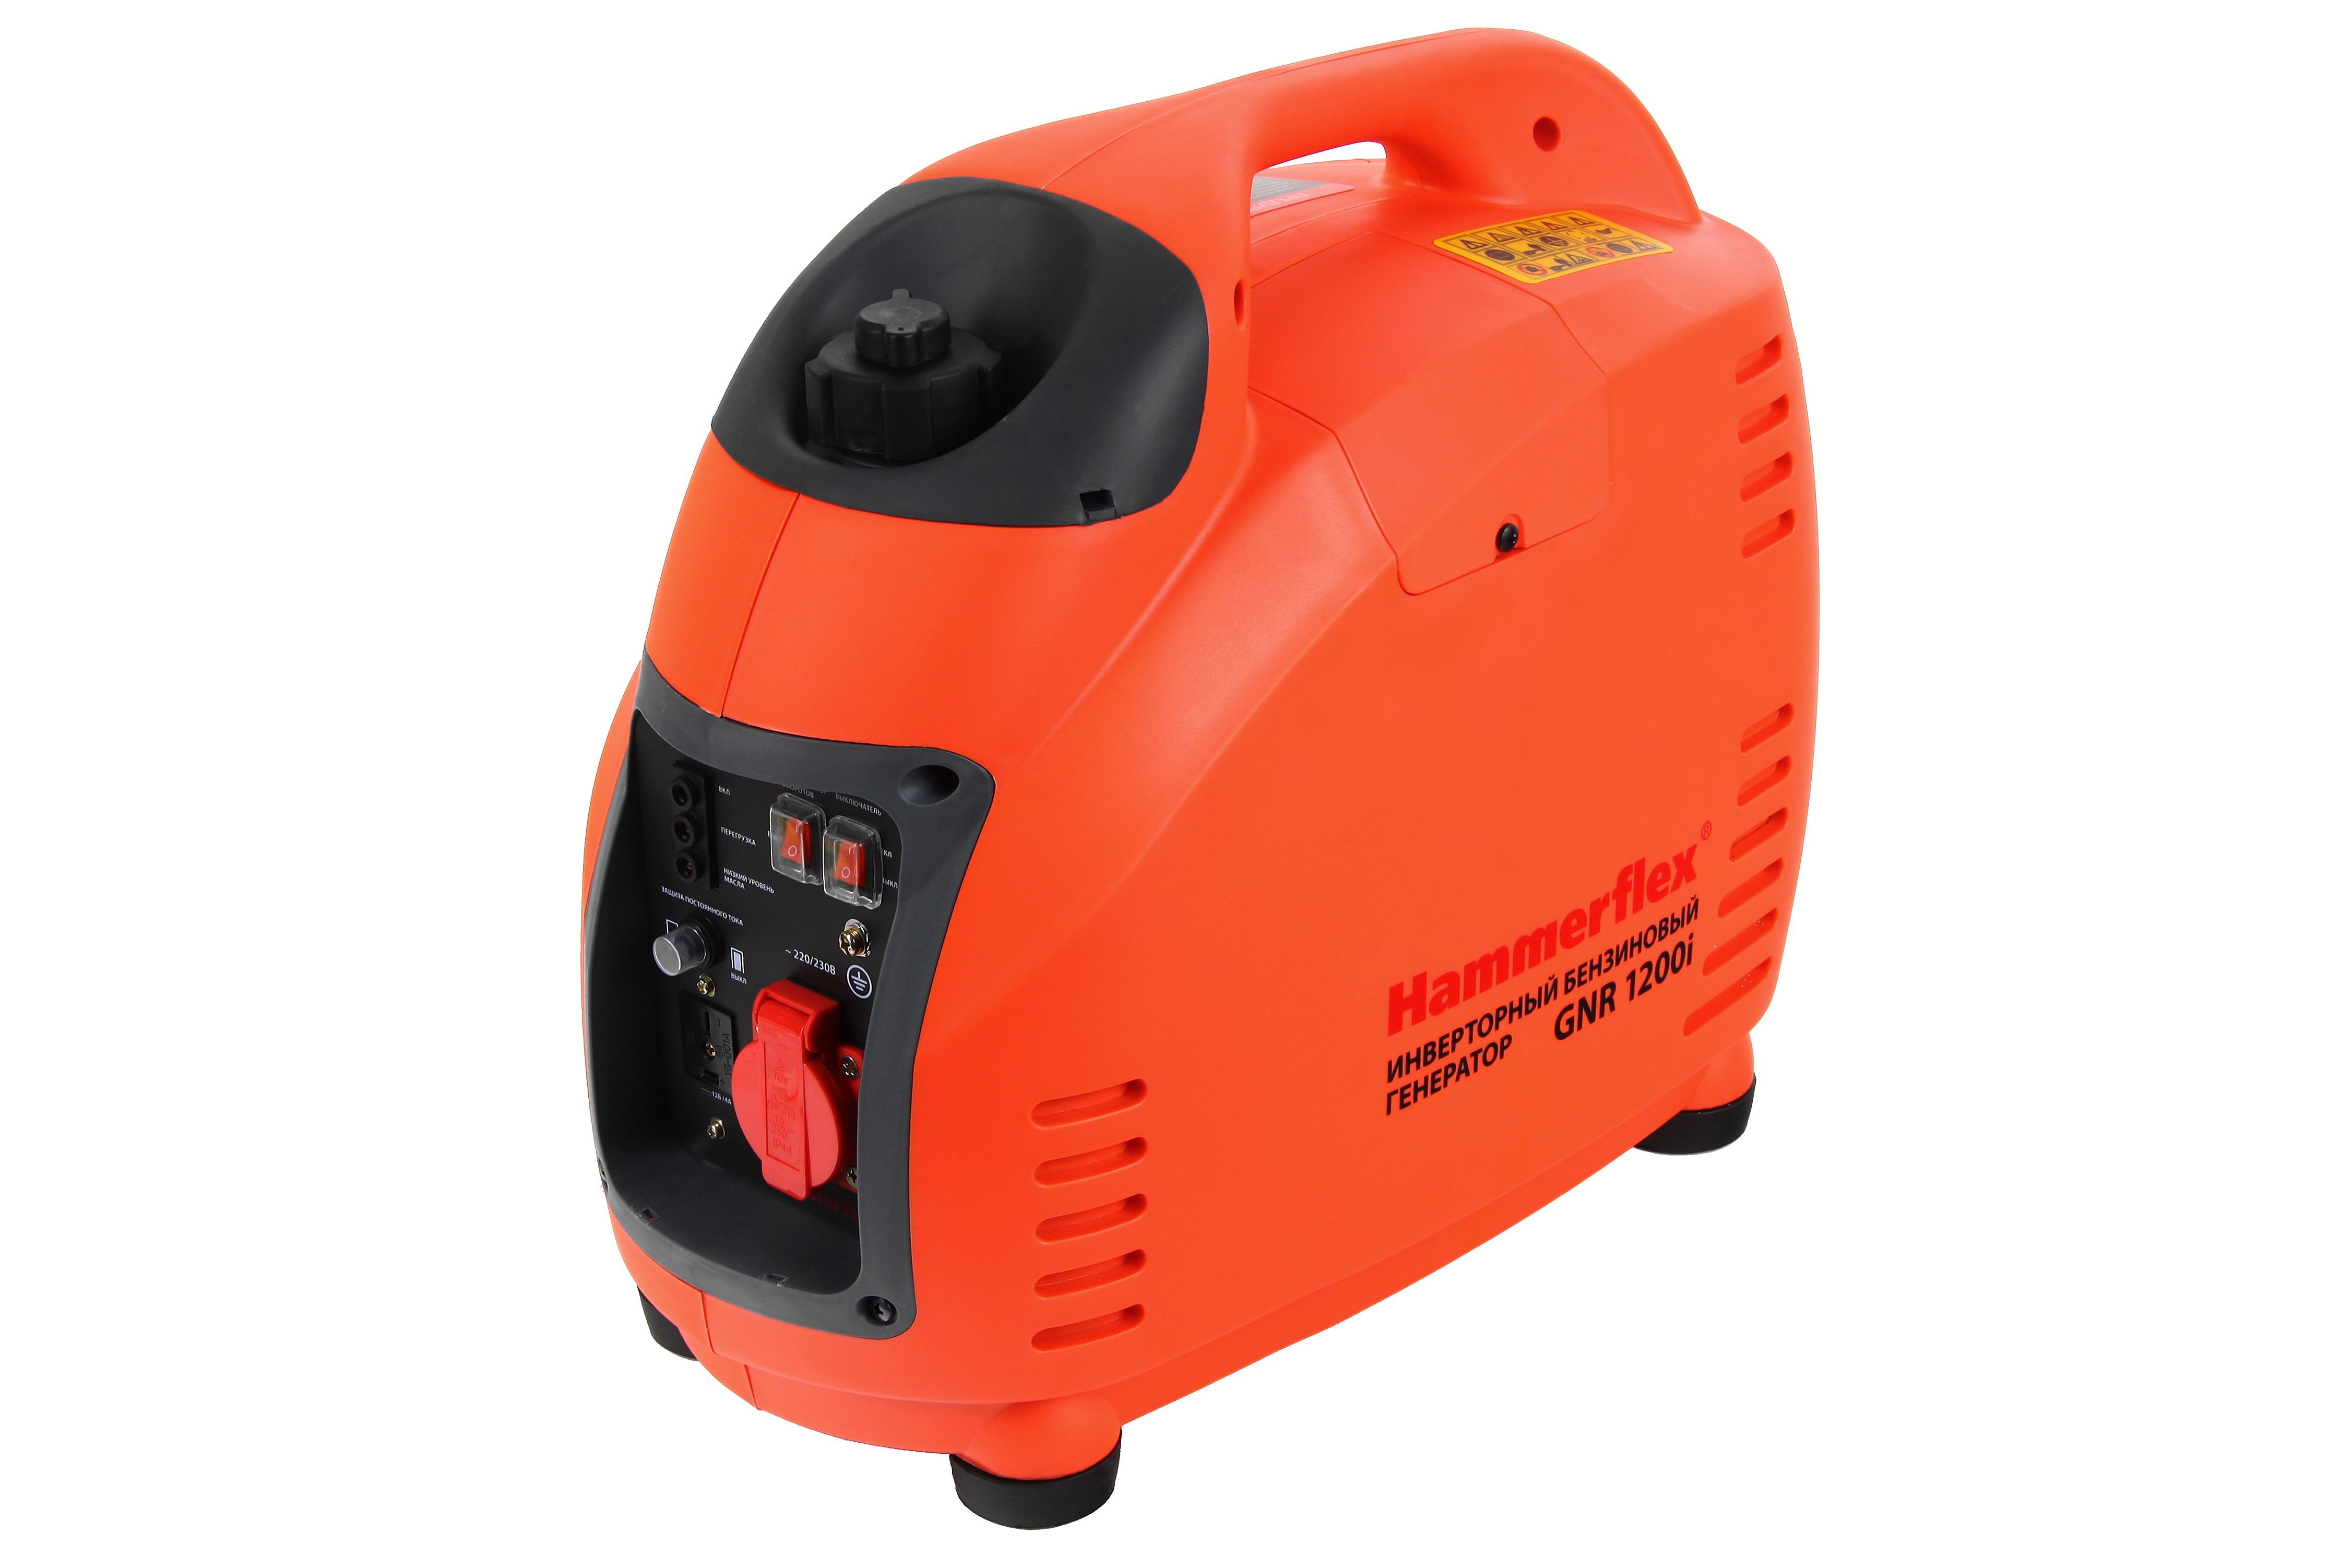 Инверторный генератор Hammer Gnr1200i